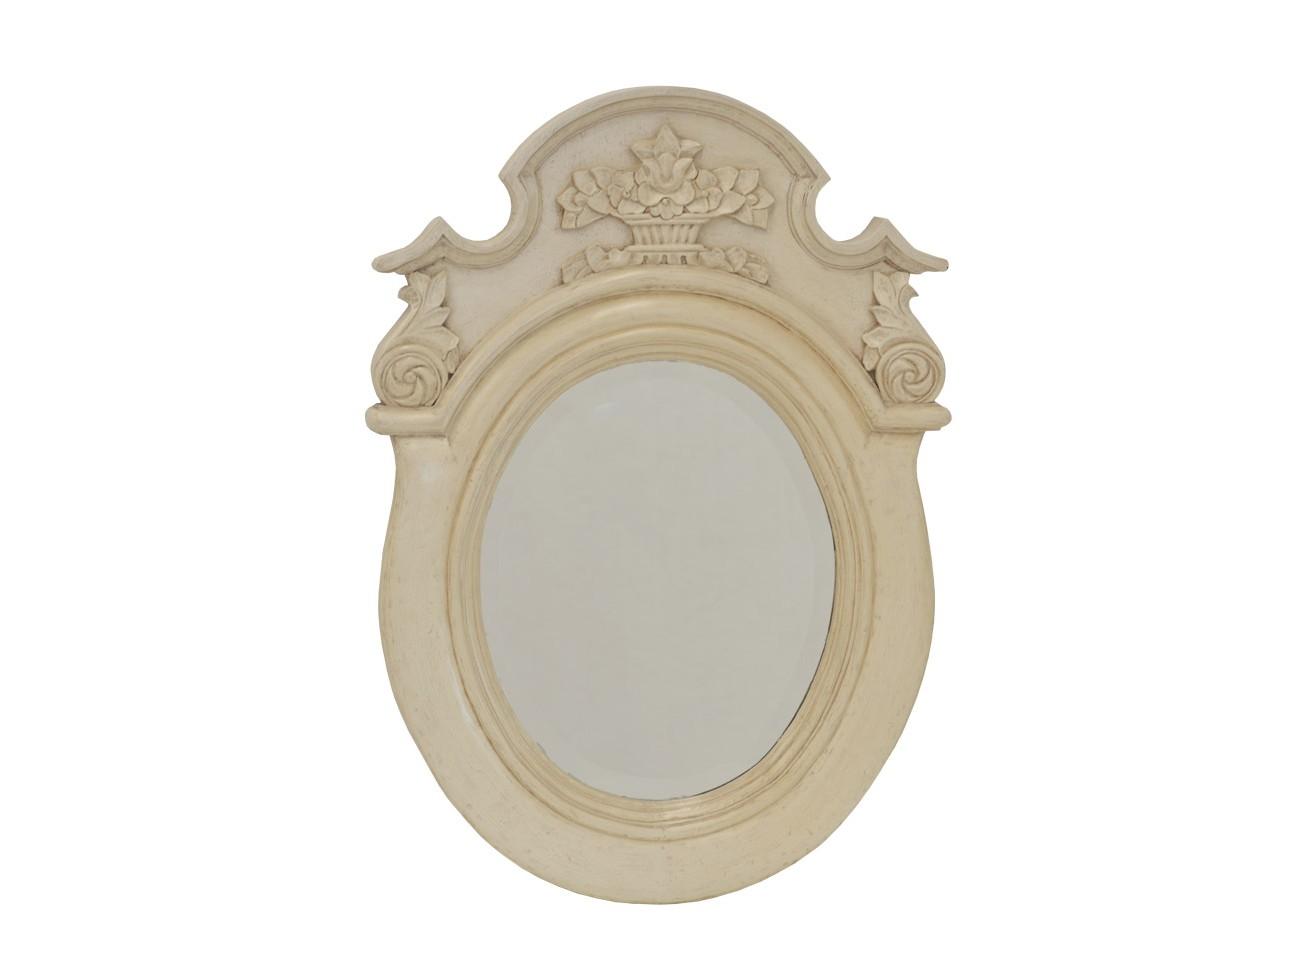 Зеркало CHLOE MIRRORНастенные зеркала<br><br><br>Material: Дерево<br>Ширина см: 70<br>Высота см: 49<br>Глубина см: 4